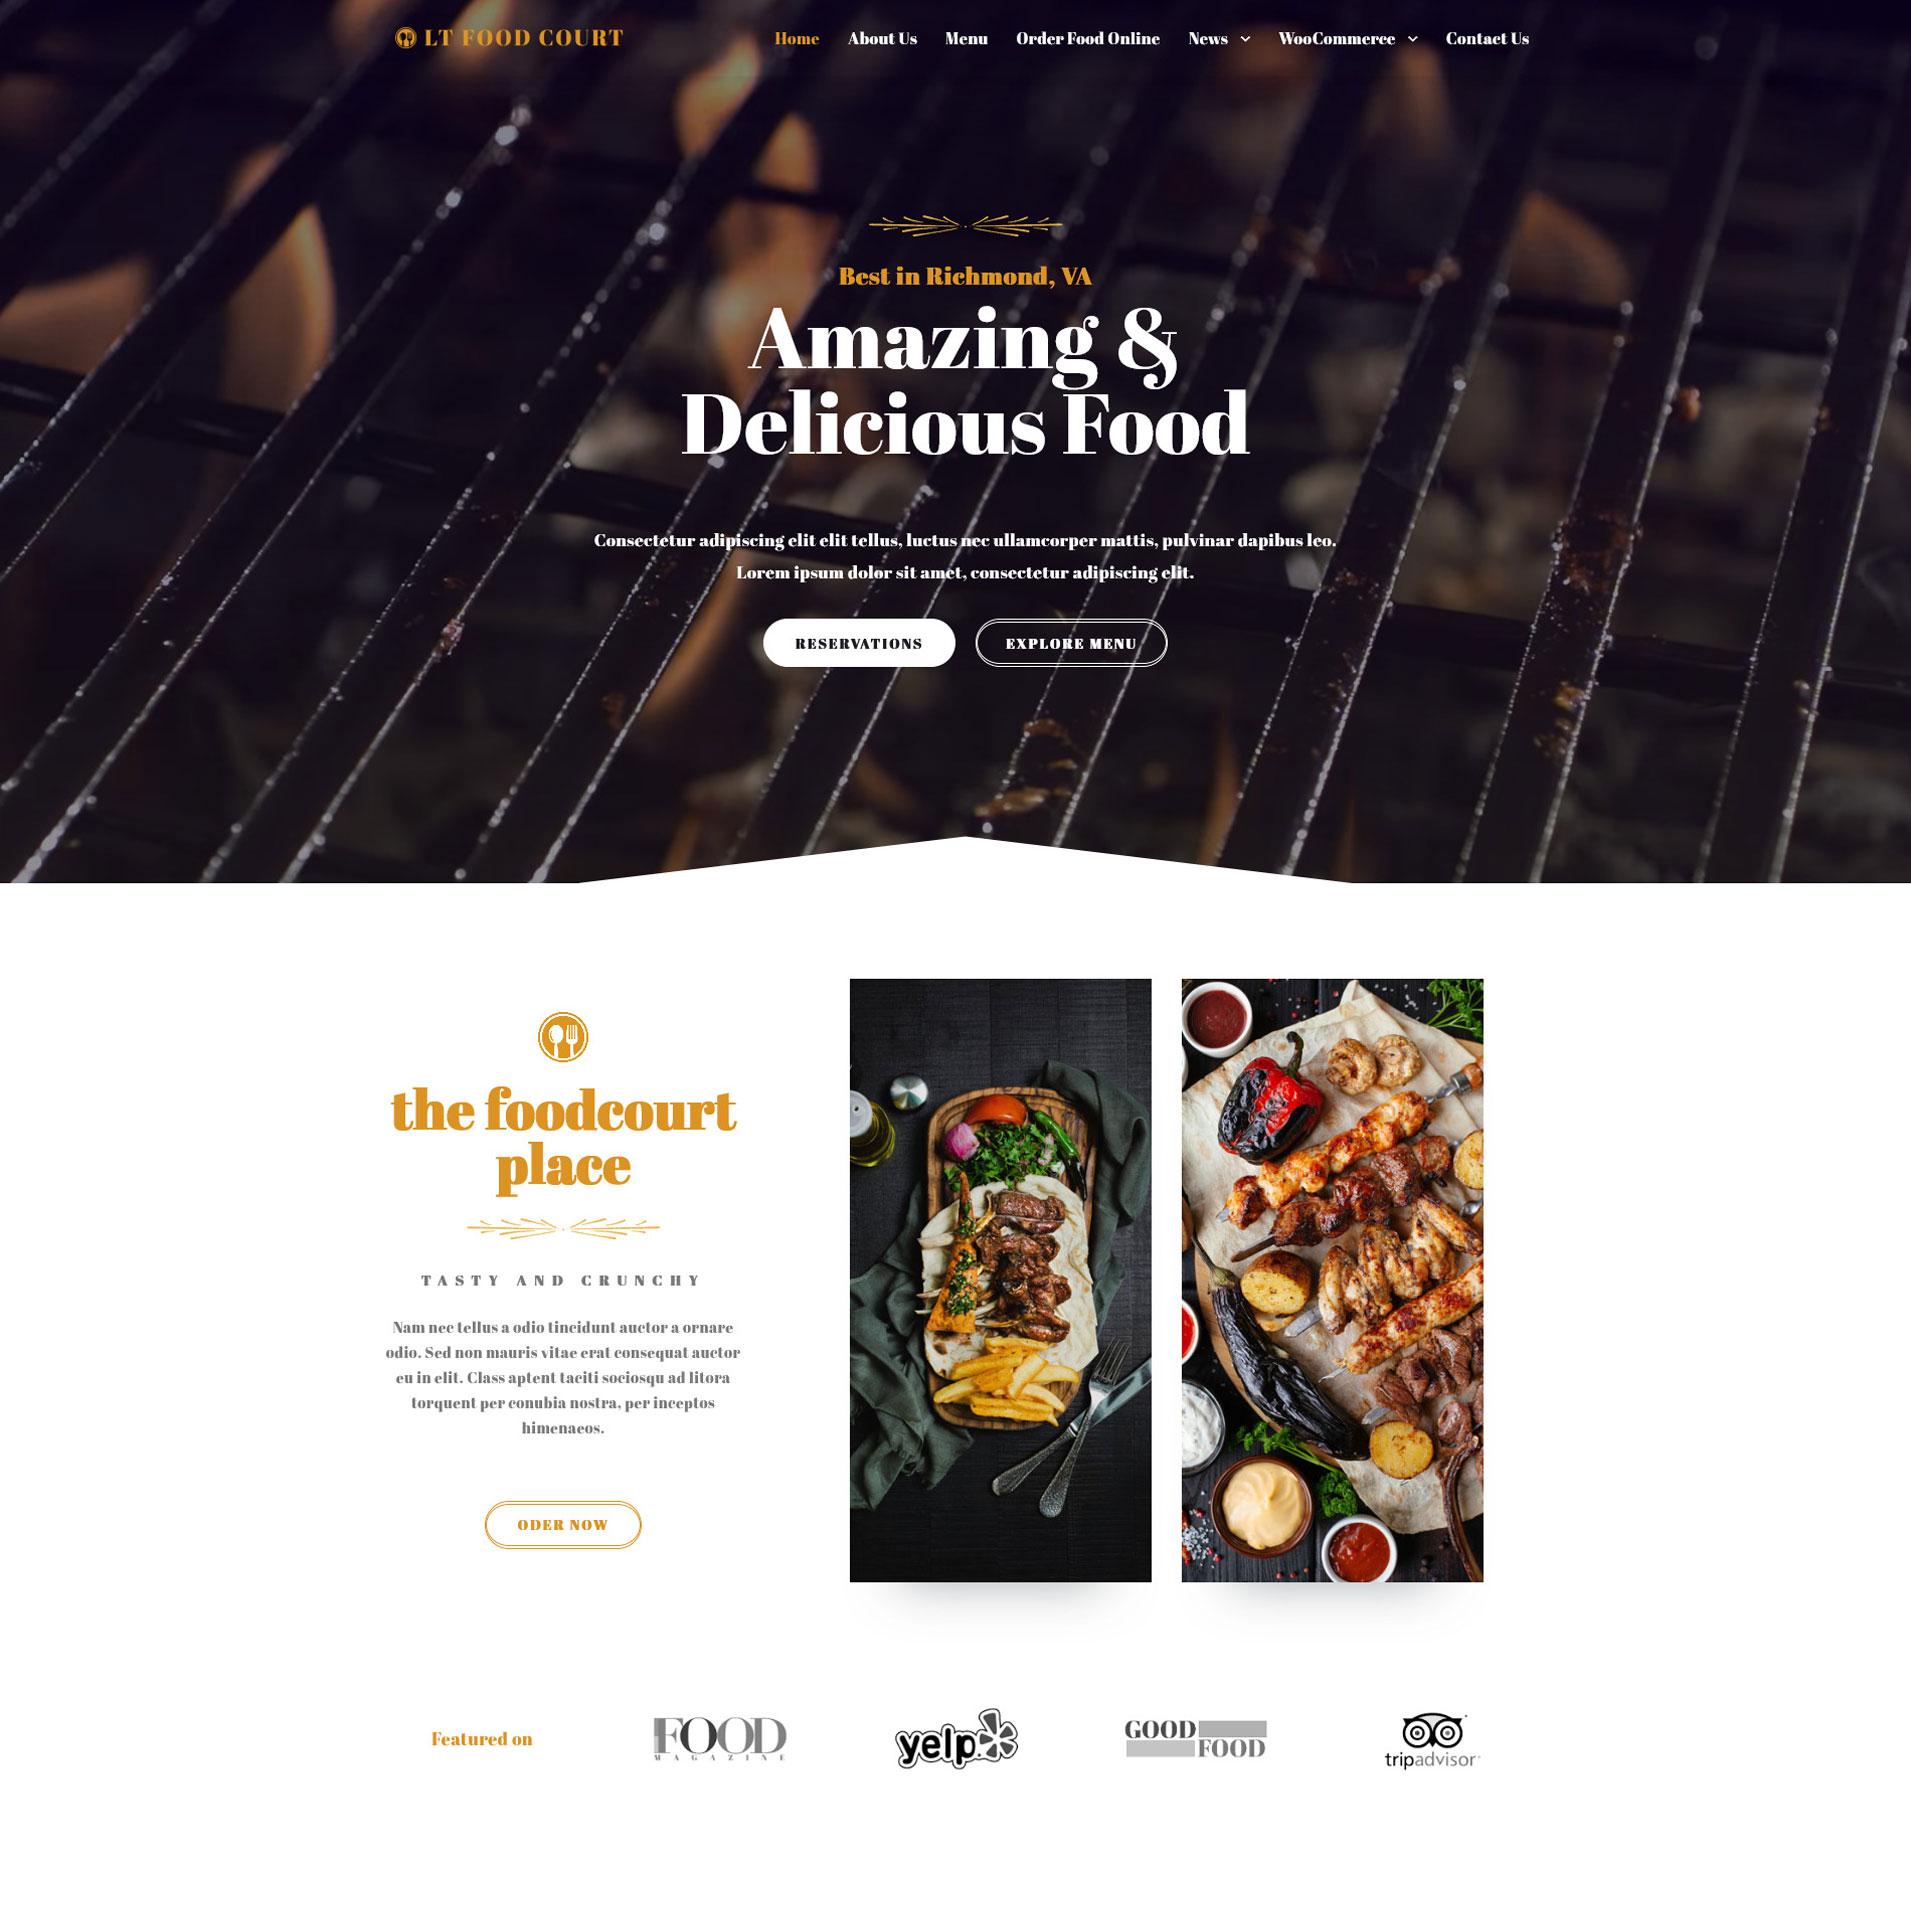 https://ltheme.com/project/lt-food-court-free-responsive-food-order-food-court-wordpress-theme/